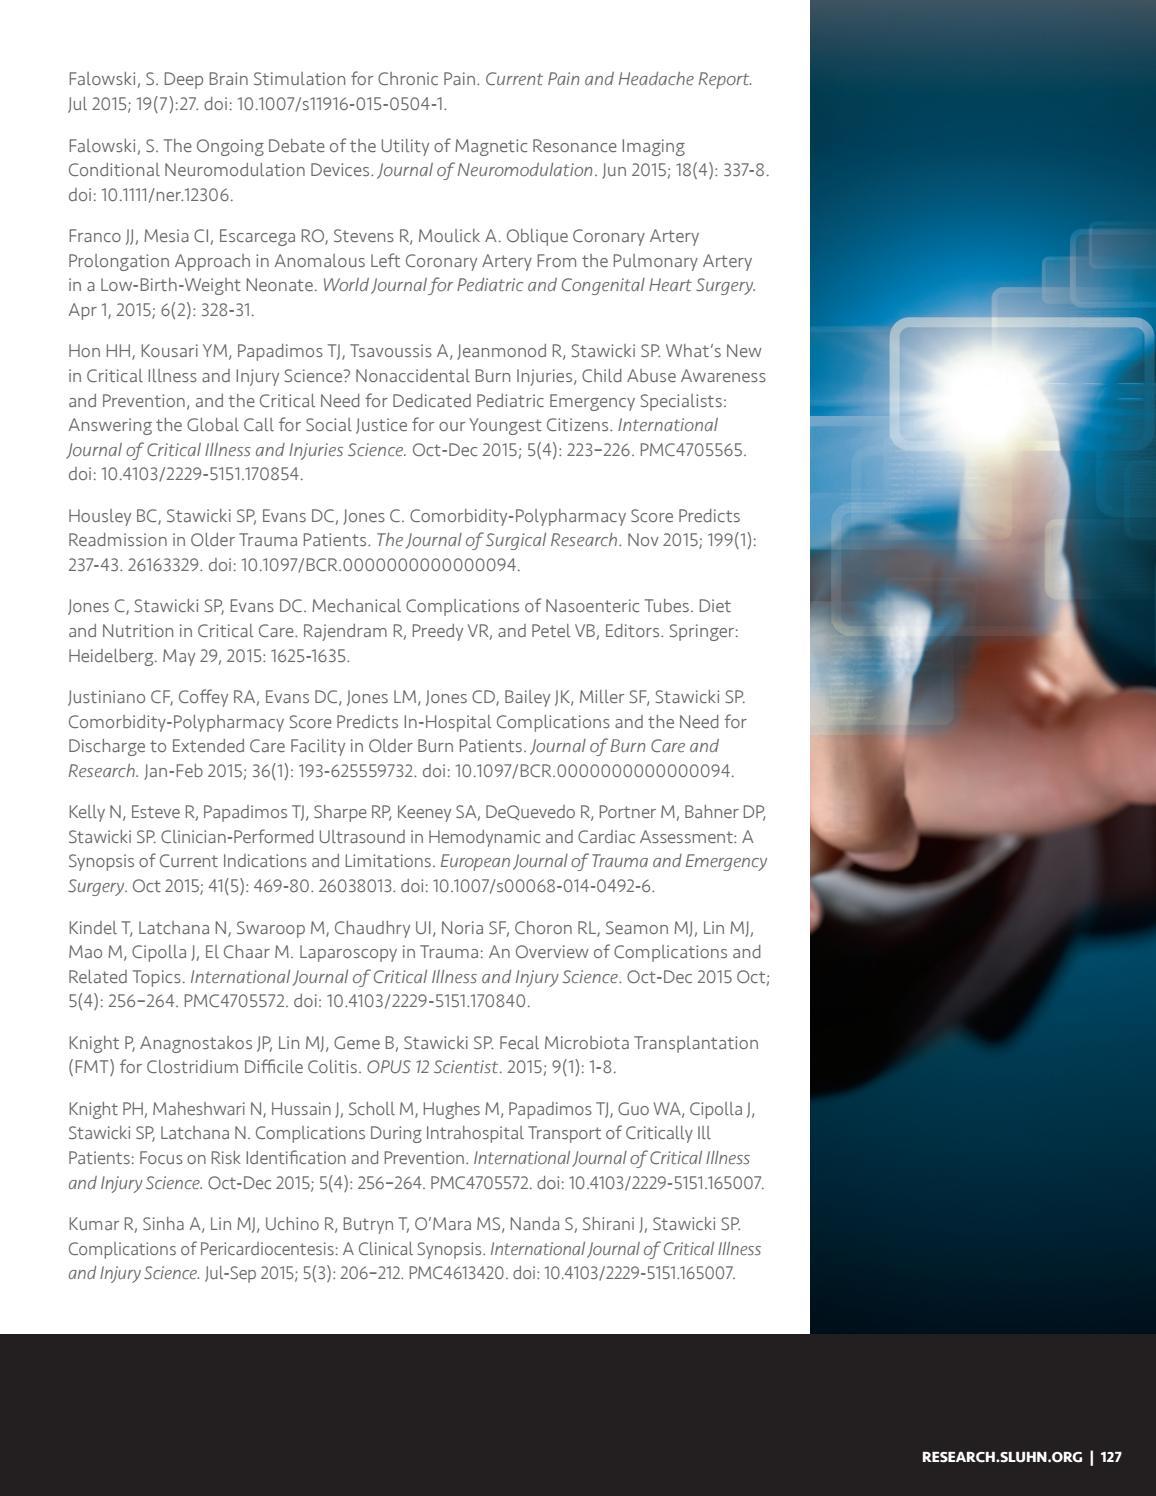 St  Luke's Research & Innovation: Annual Report 2016 by KSA&D